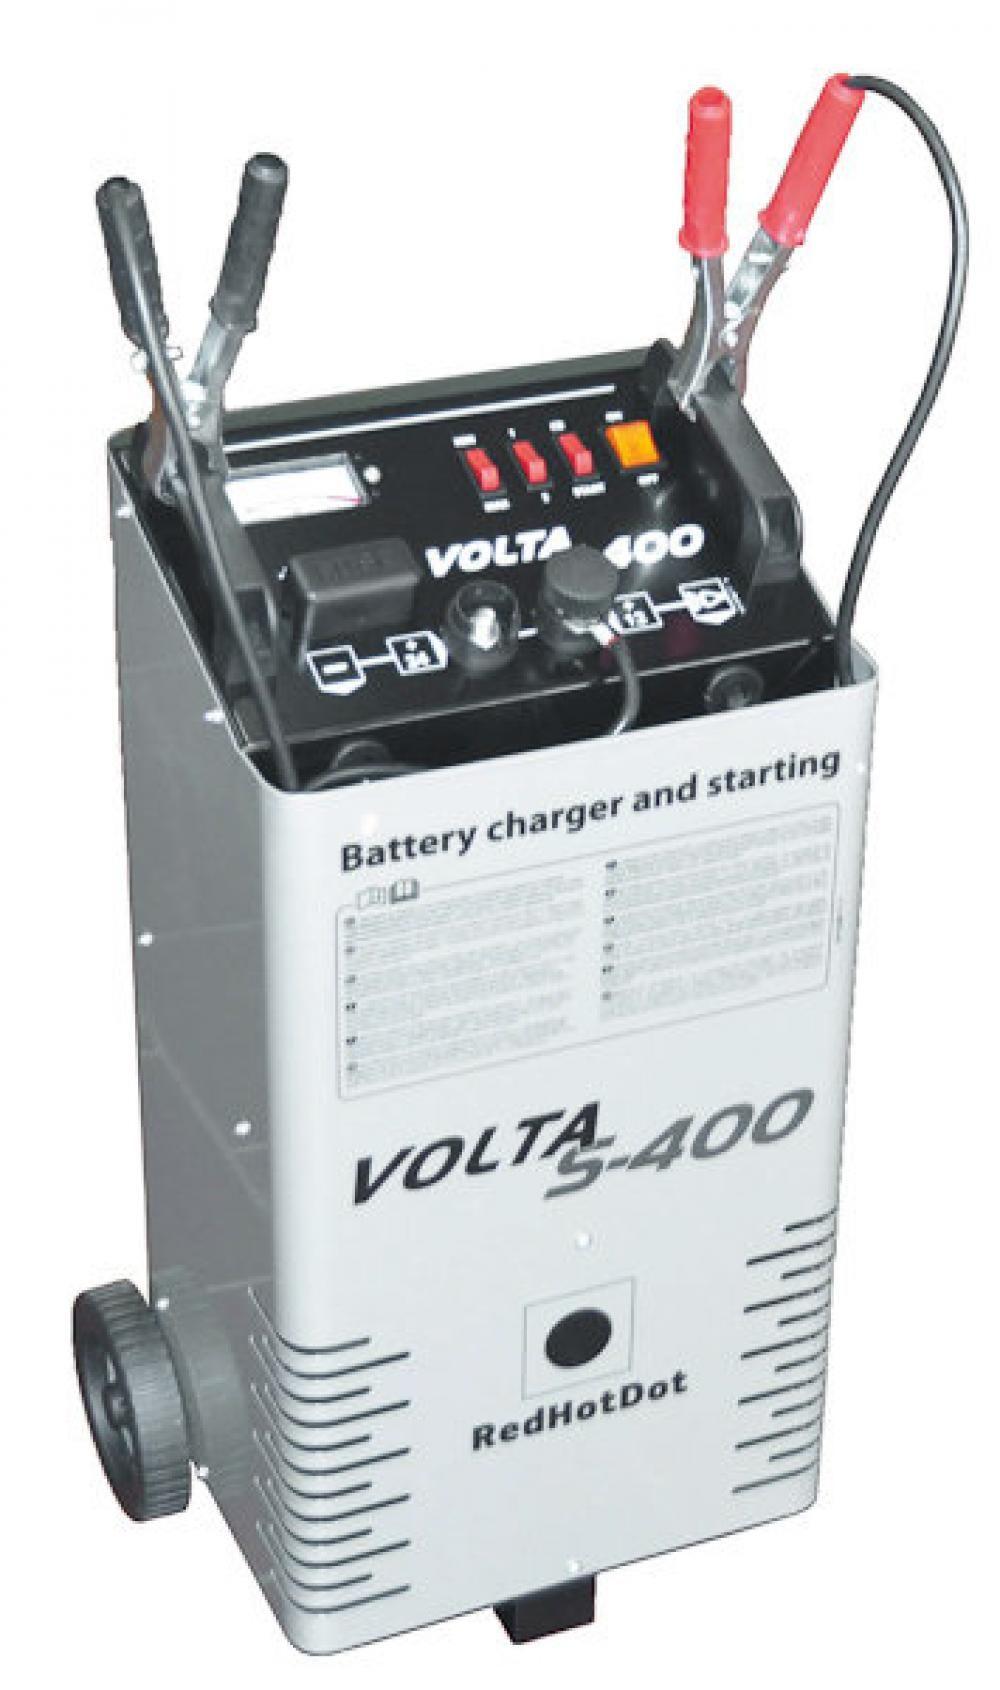 RedHotDot VOLTA S-400